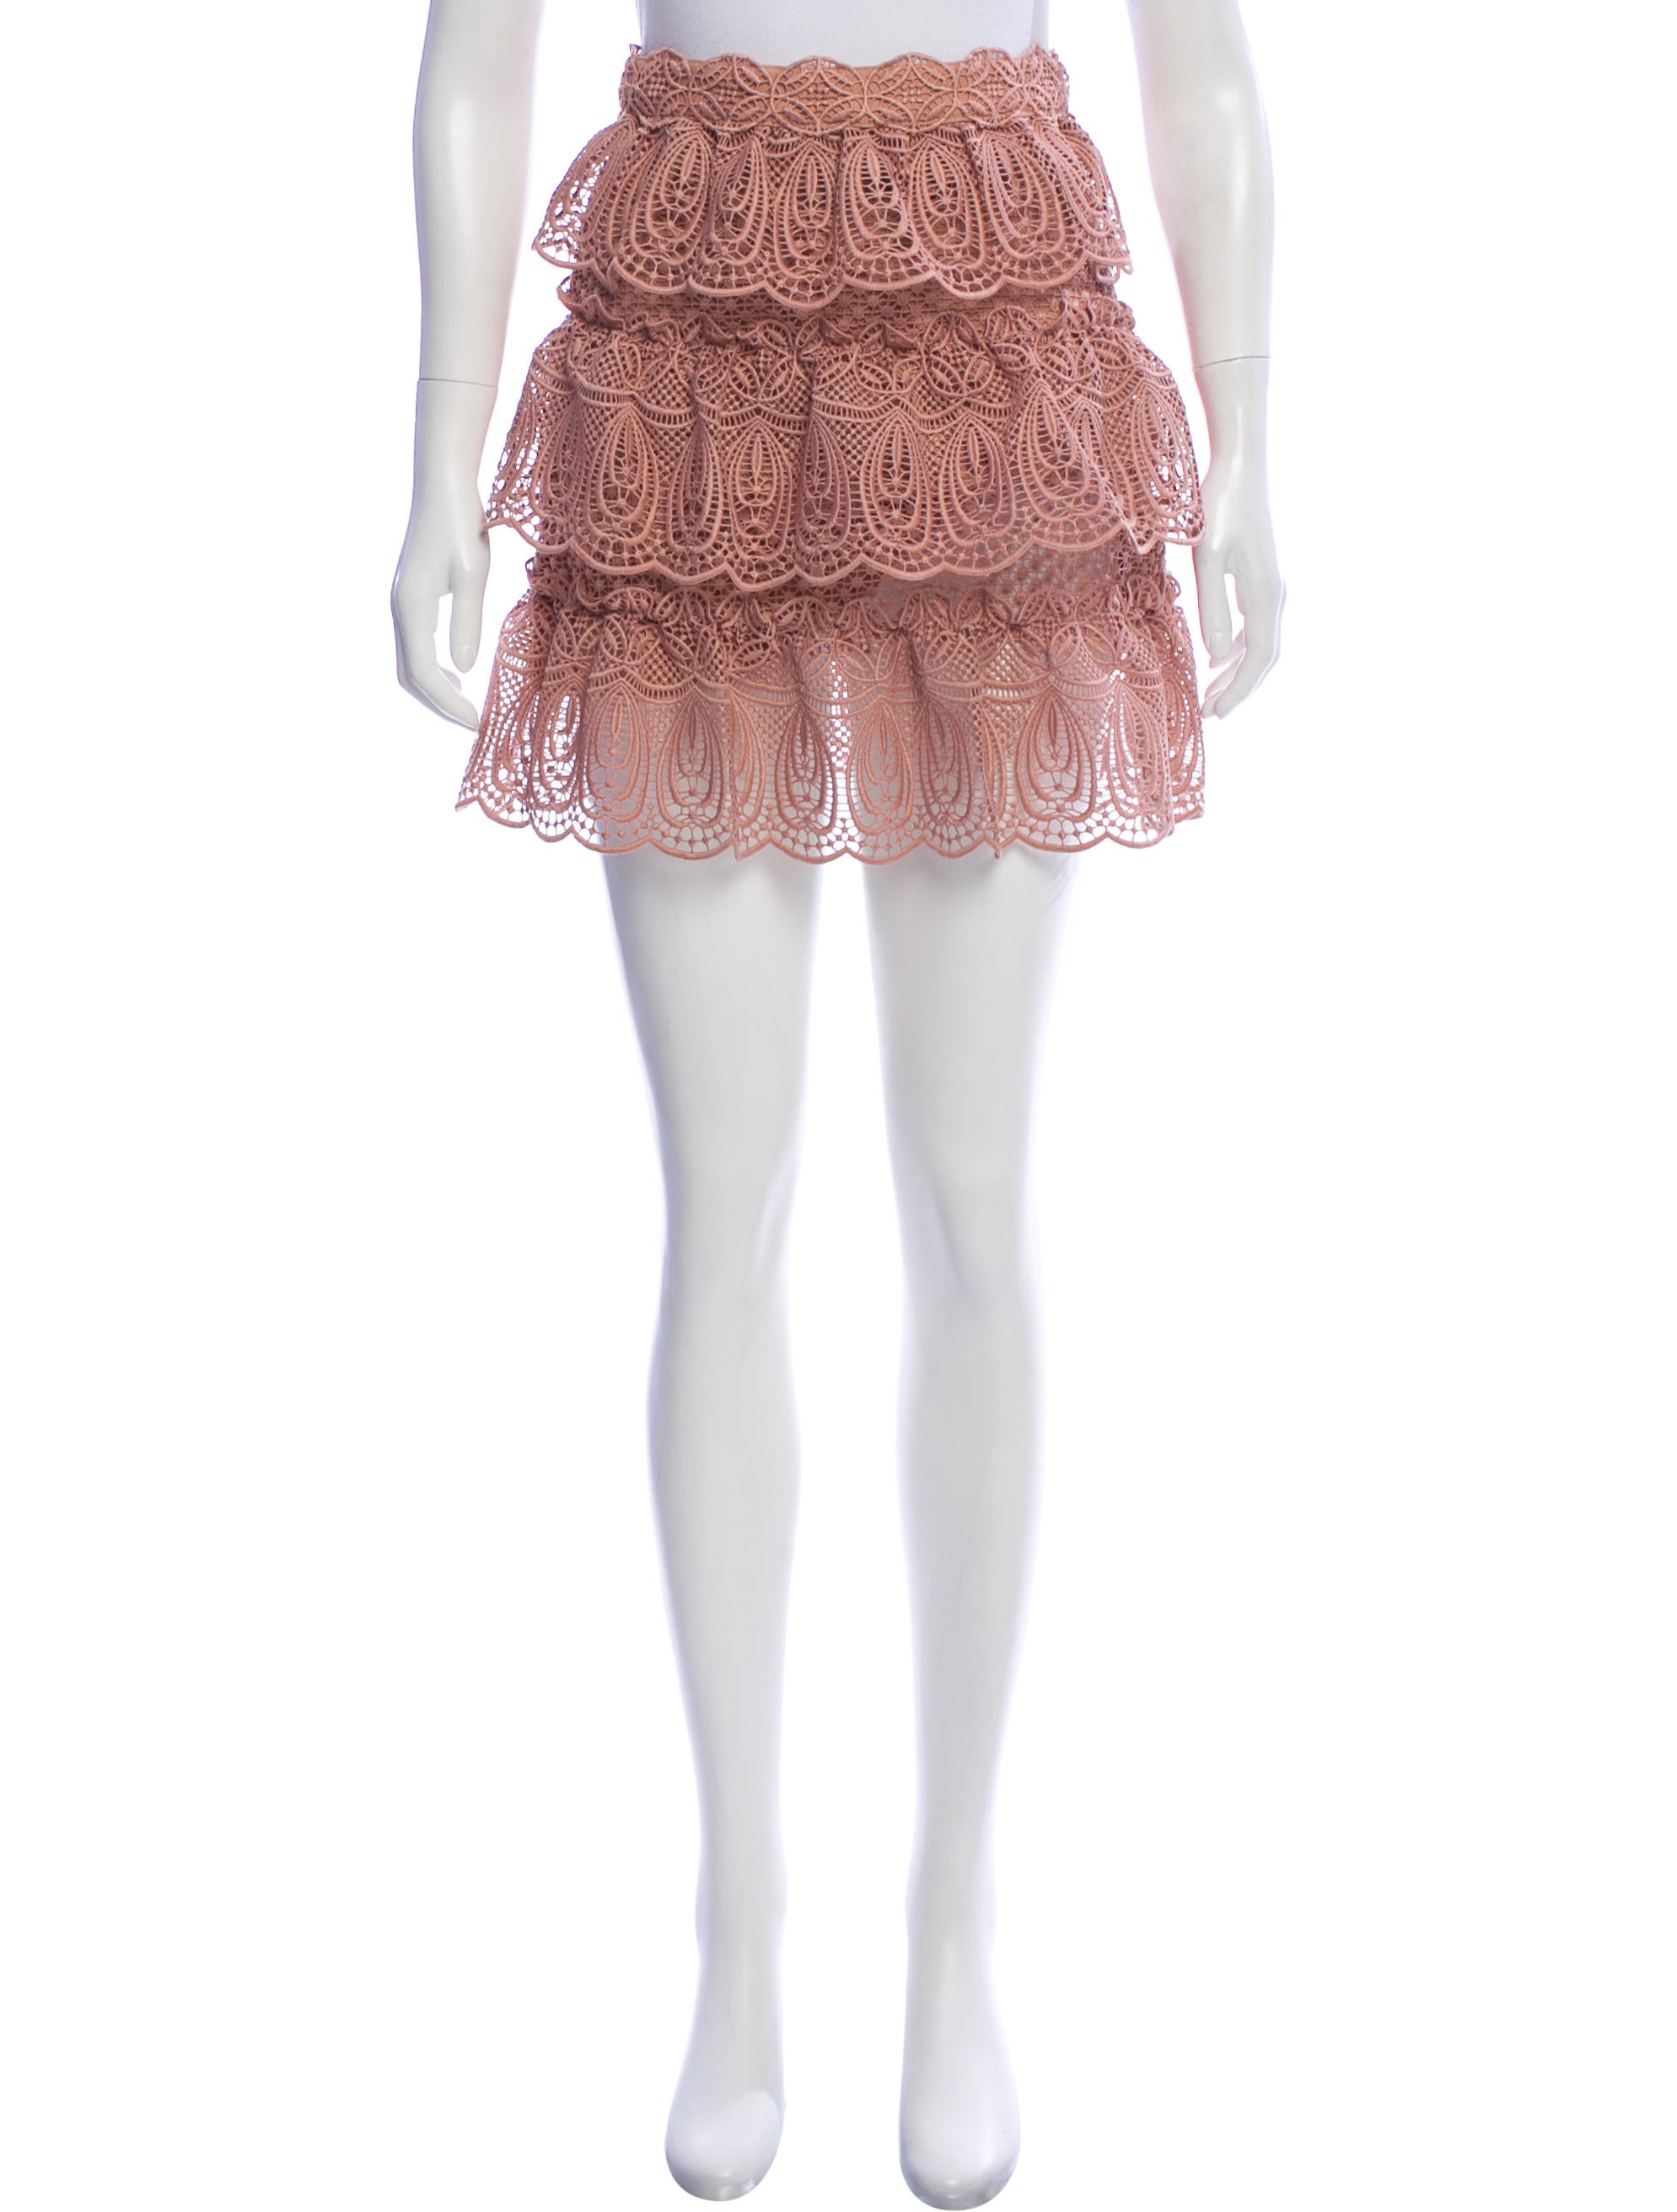 9bc1930a0 Self-Portrait Crochet Mini Skirt - Clothing - WSELF29177 | The RealReal